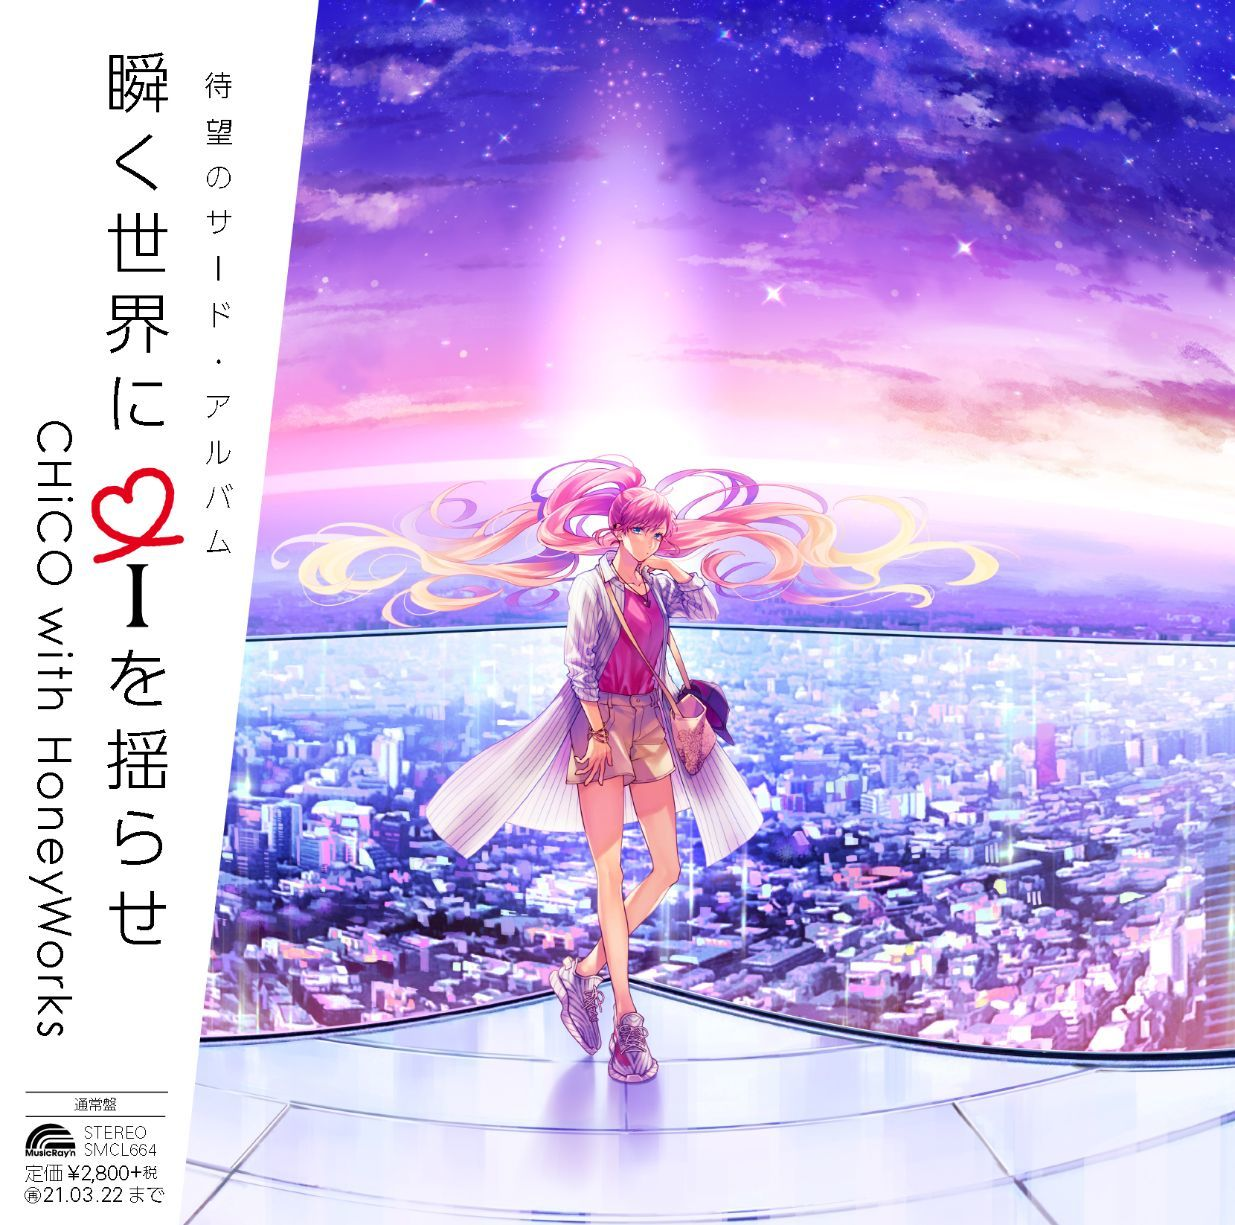 3rdアルバム『瞬く世界に i を揺らせ』通常版